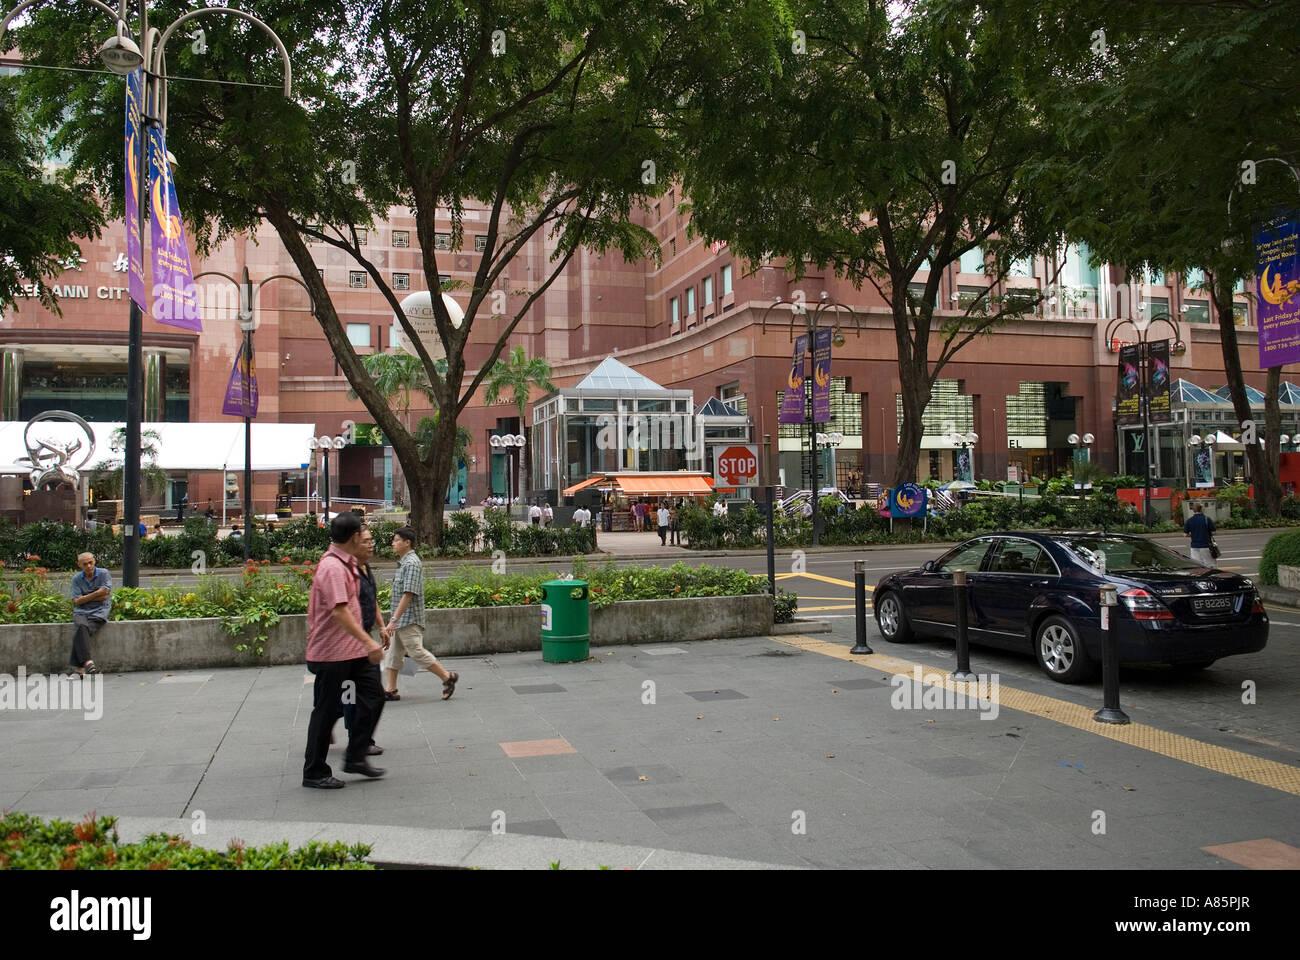 Orchard Road and Takashimaya Mall, Singapore. - Stock Image